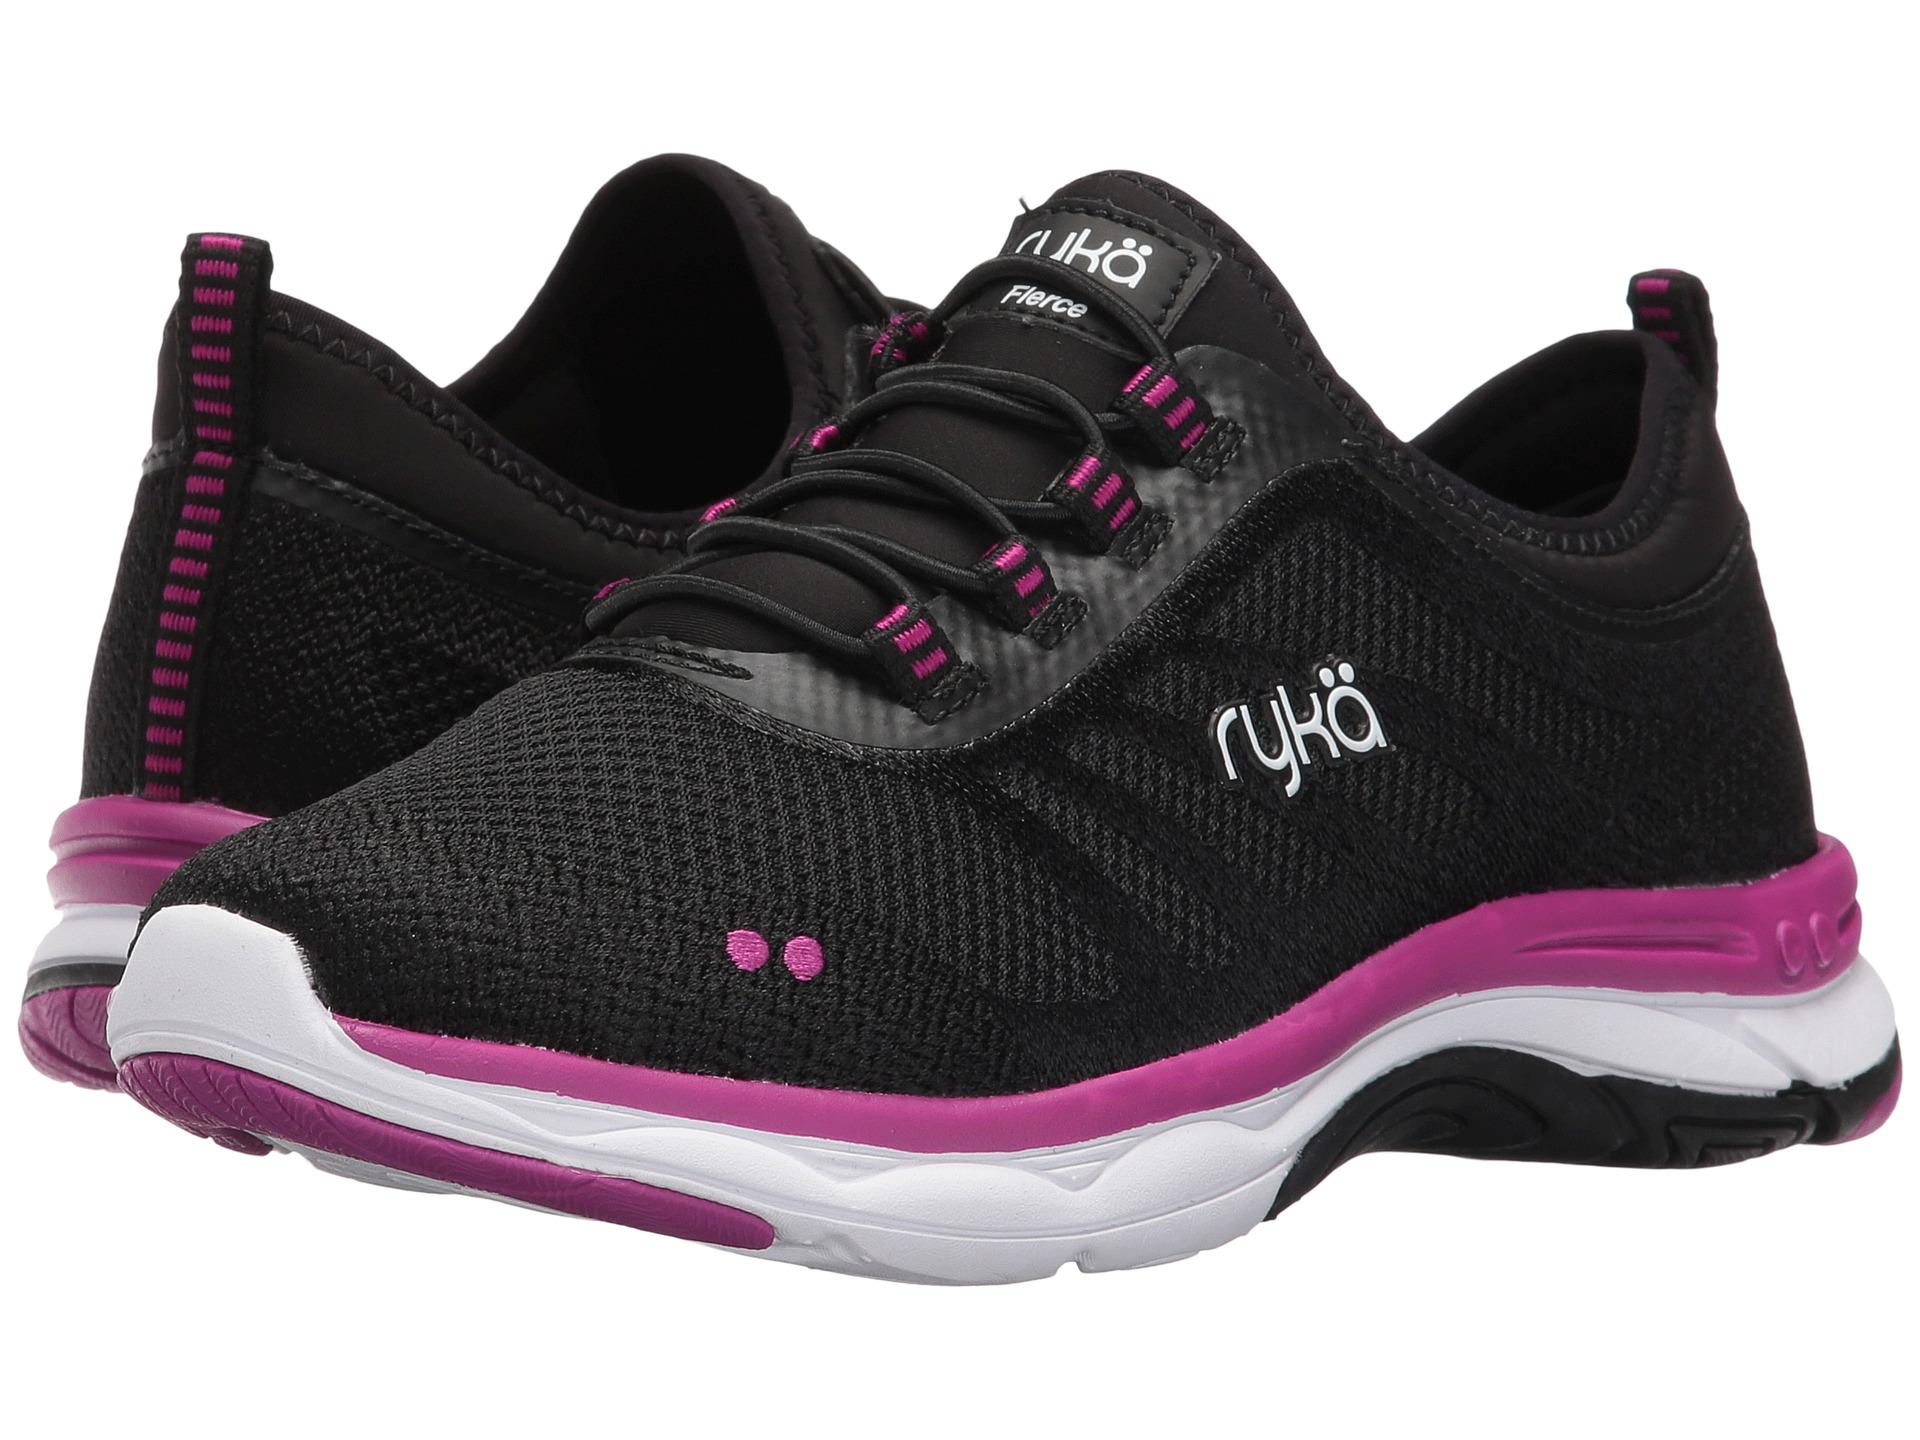 Buy Ryka Dominion Shoes Blue Women's Sneakers XYBMSEL. Women's Sneakers - Ryka Dominion Shoes Blue Women's Sneakers XYBMSEL. Get the support .